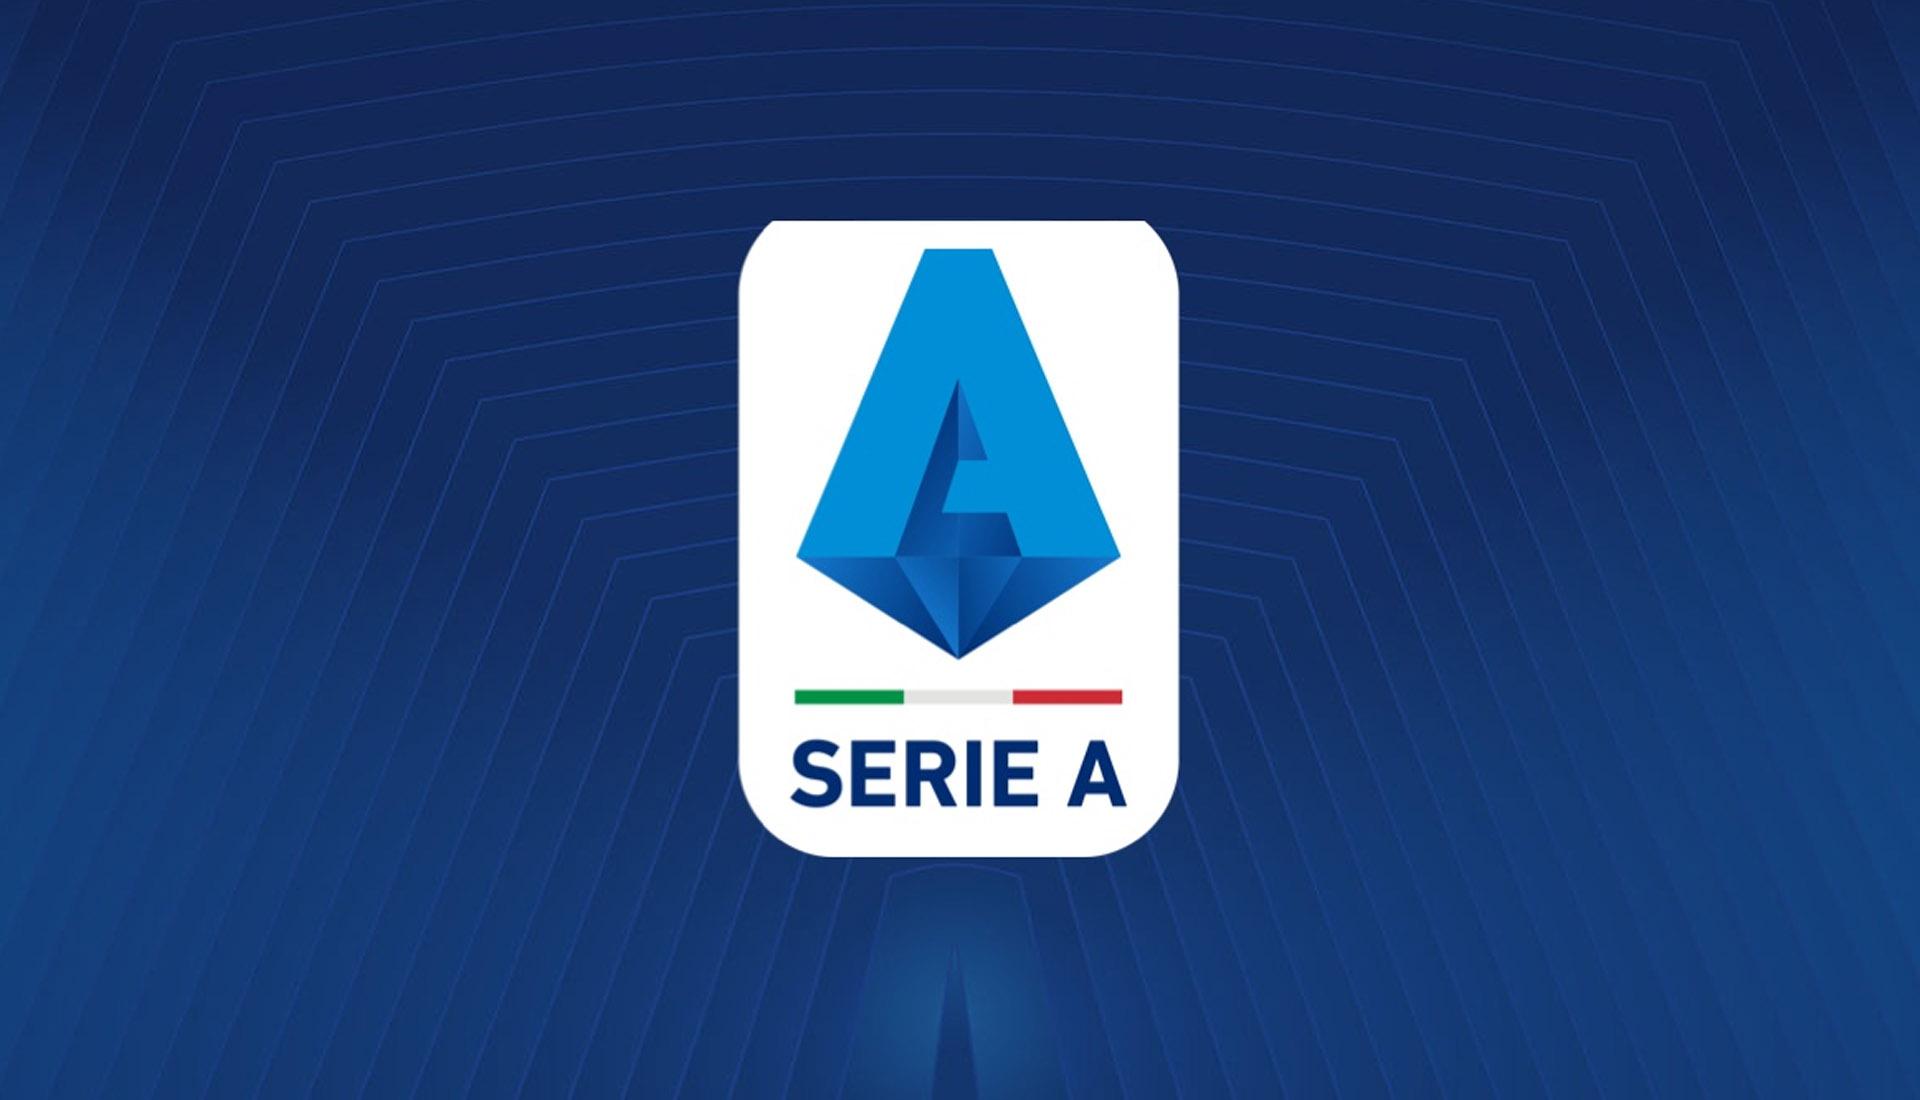 1-serie-a-logo-new.jpg